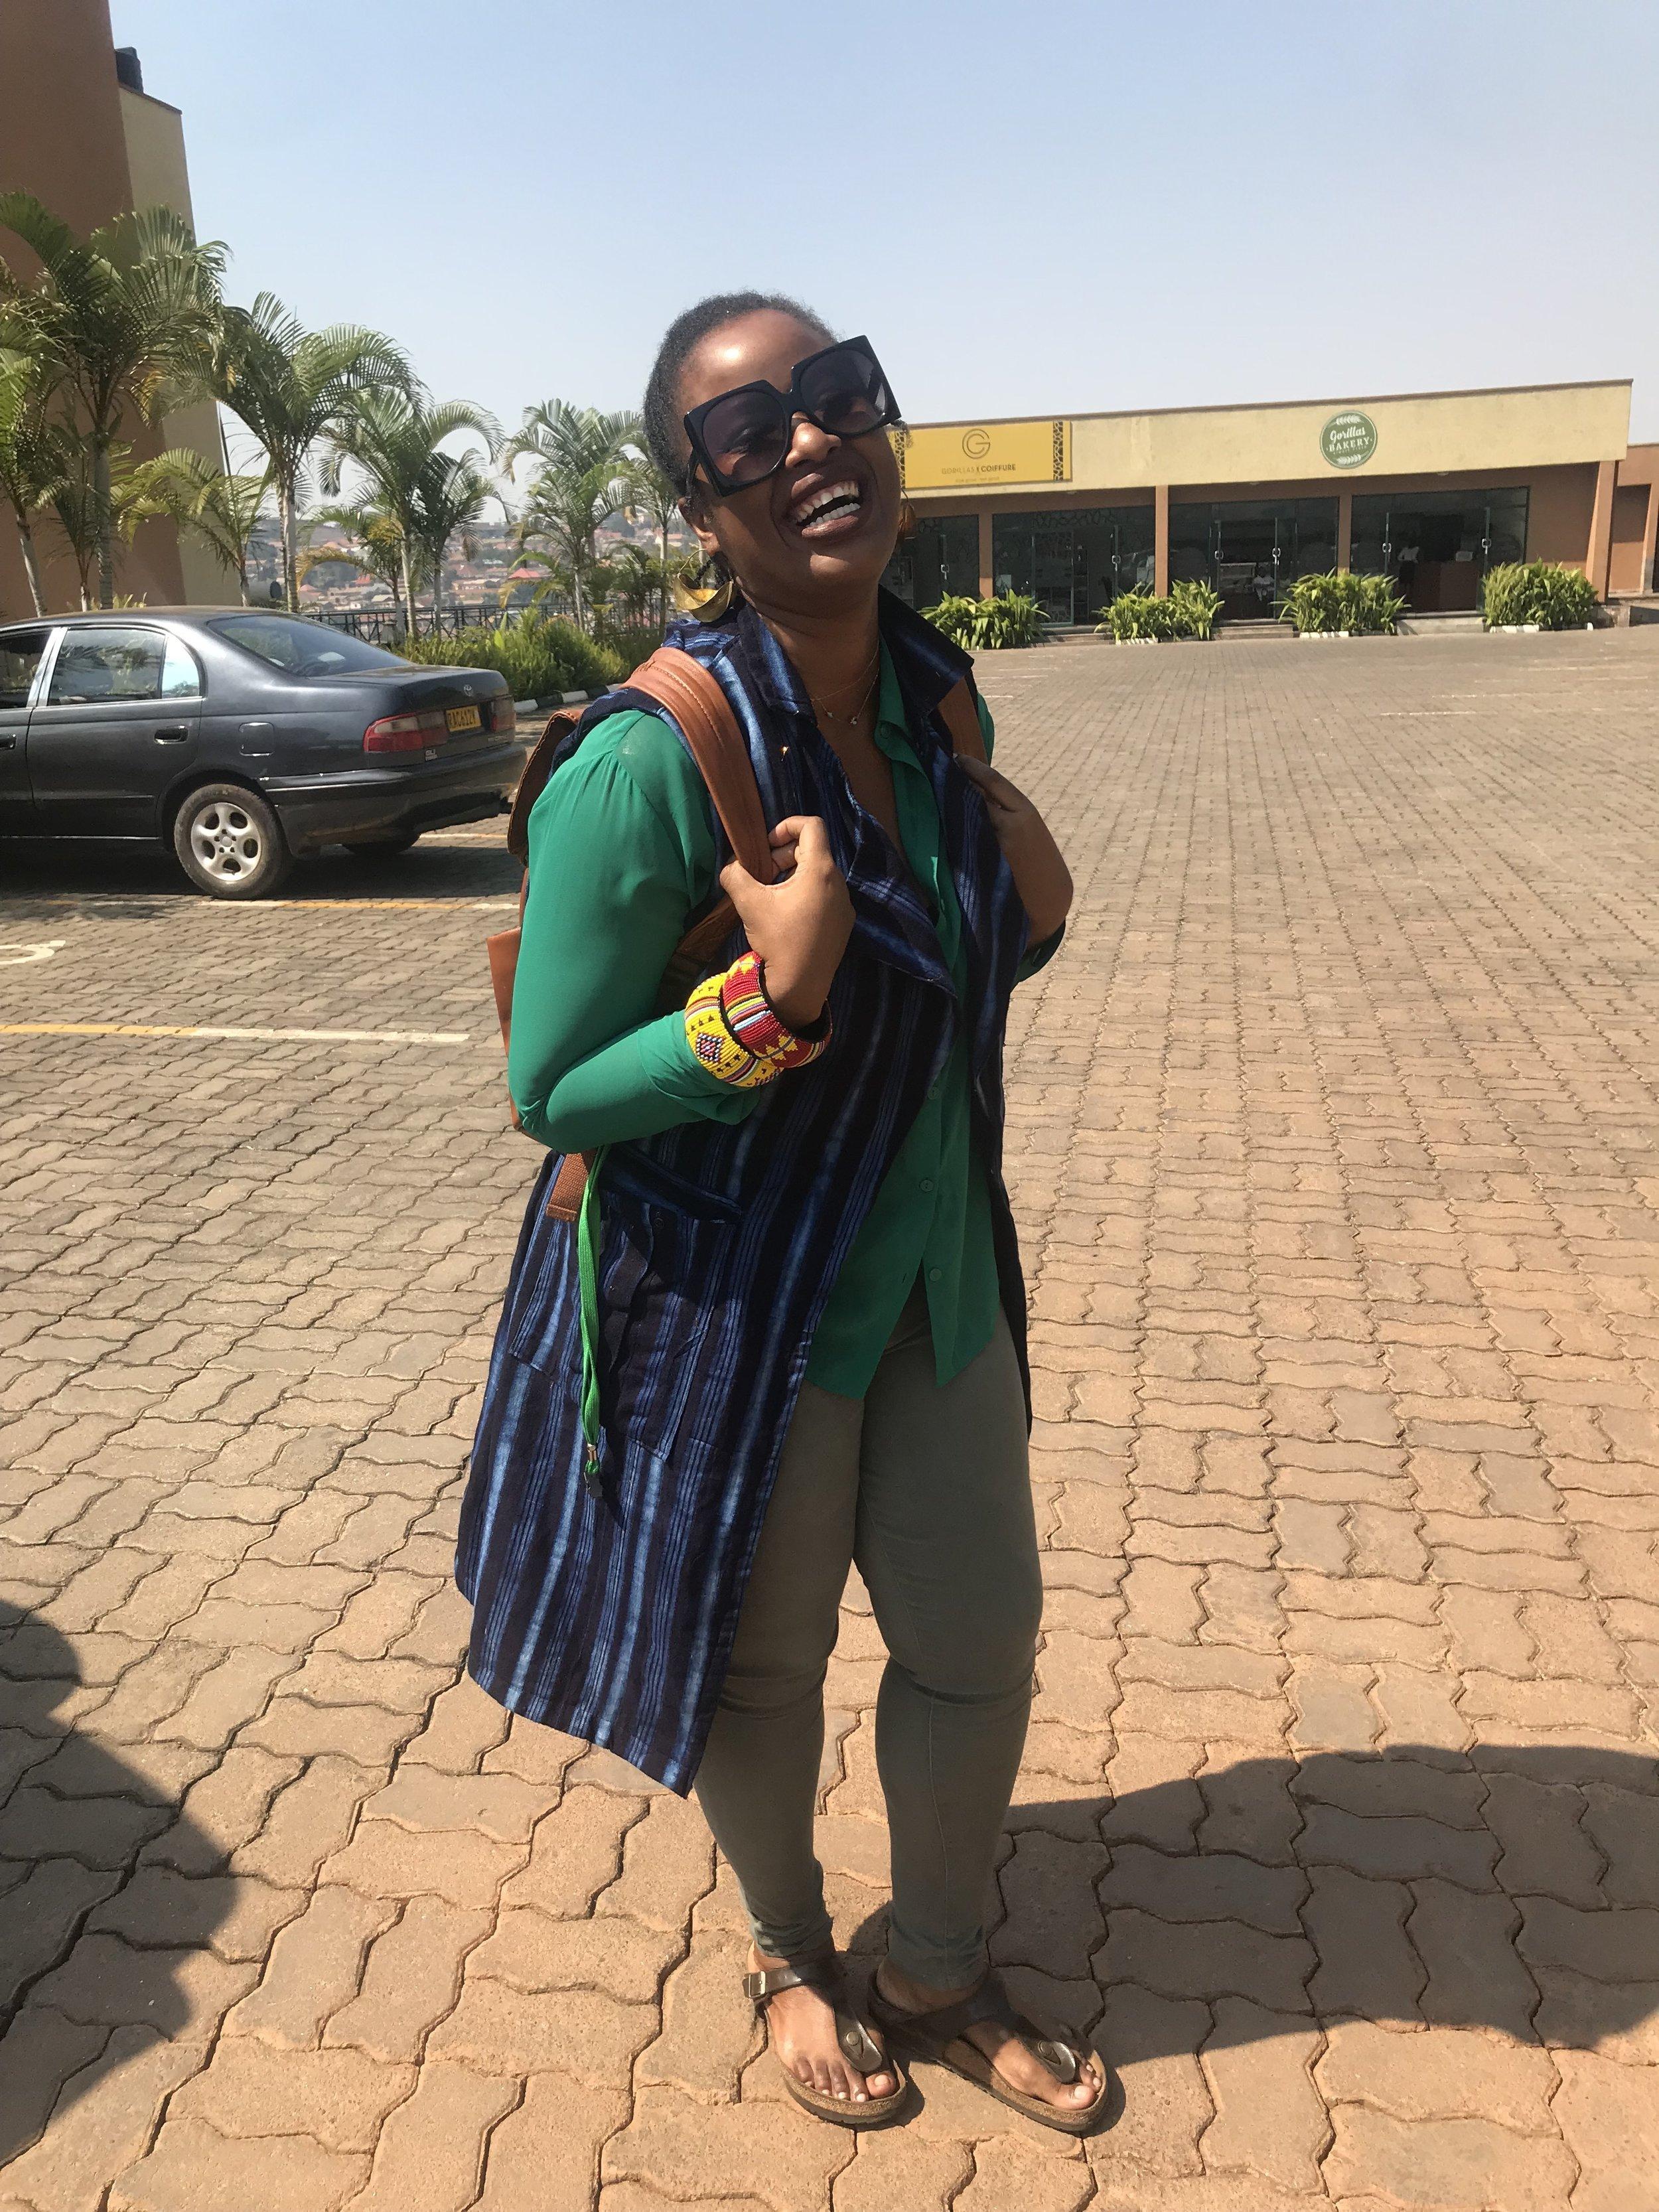 IMG_6002 2VickieRemoe-travel-kigali-rwanda-review-kwibohora25-hotels-africa.JPG